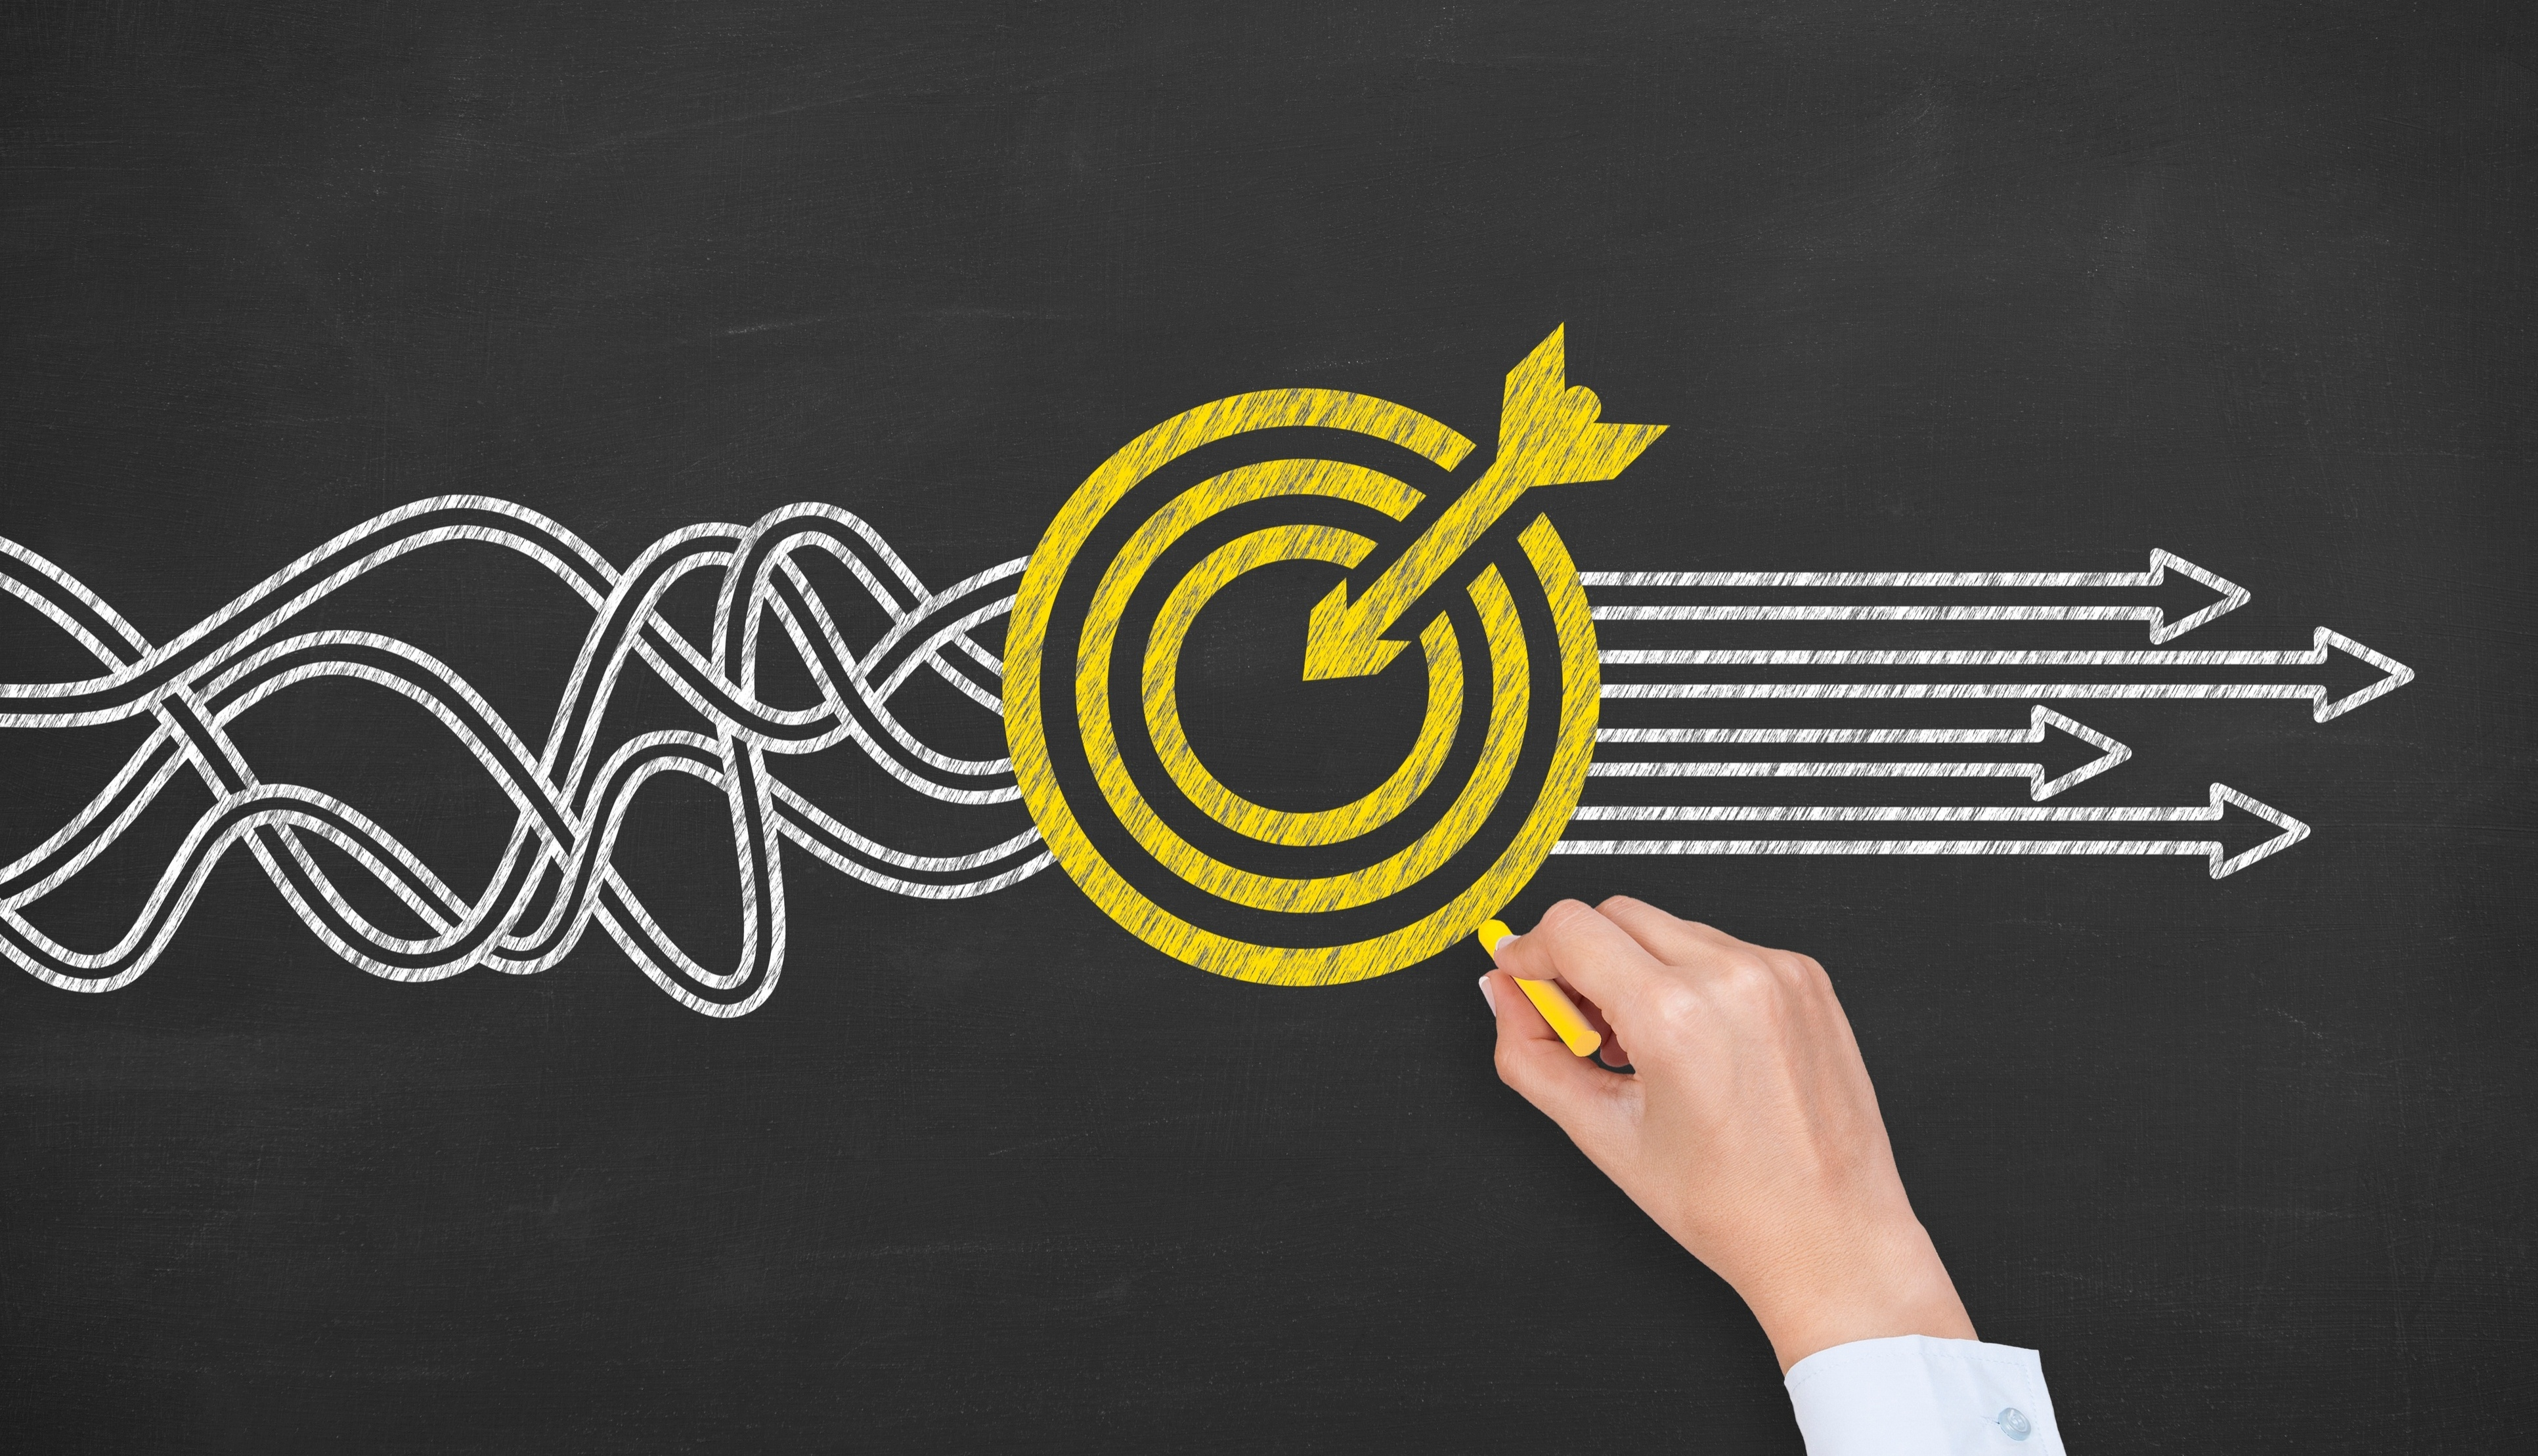 Objetivos SMART metas goals